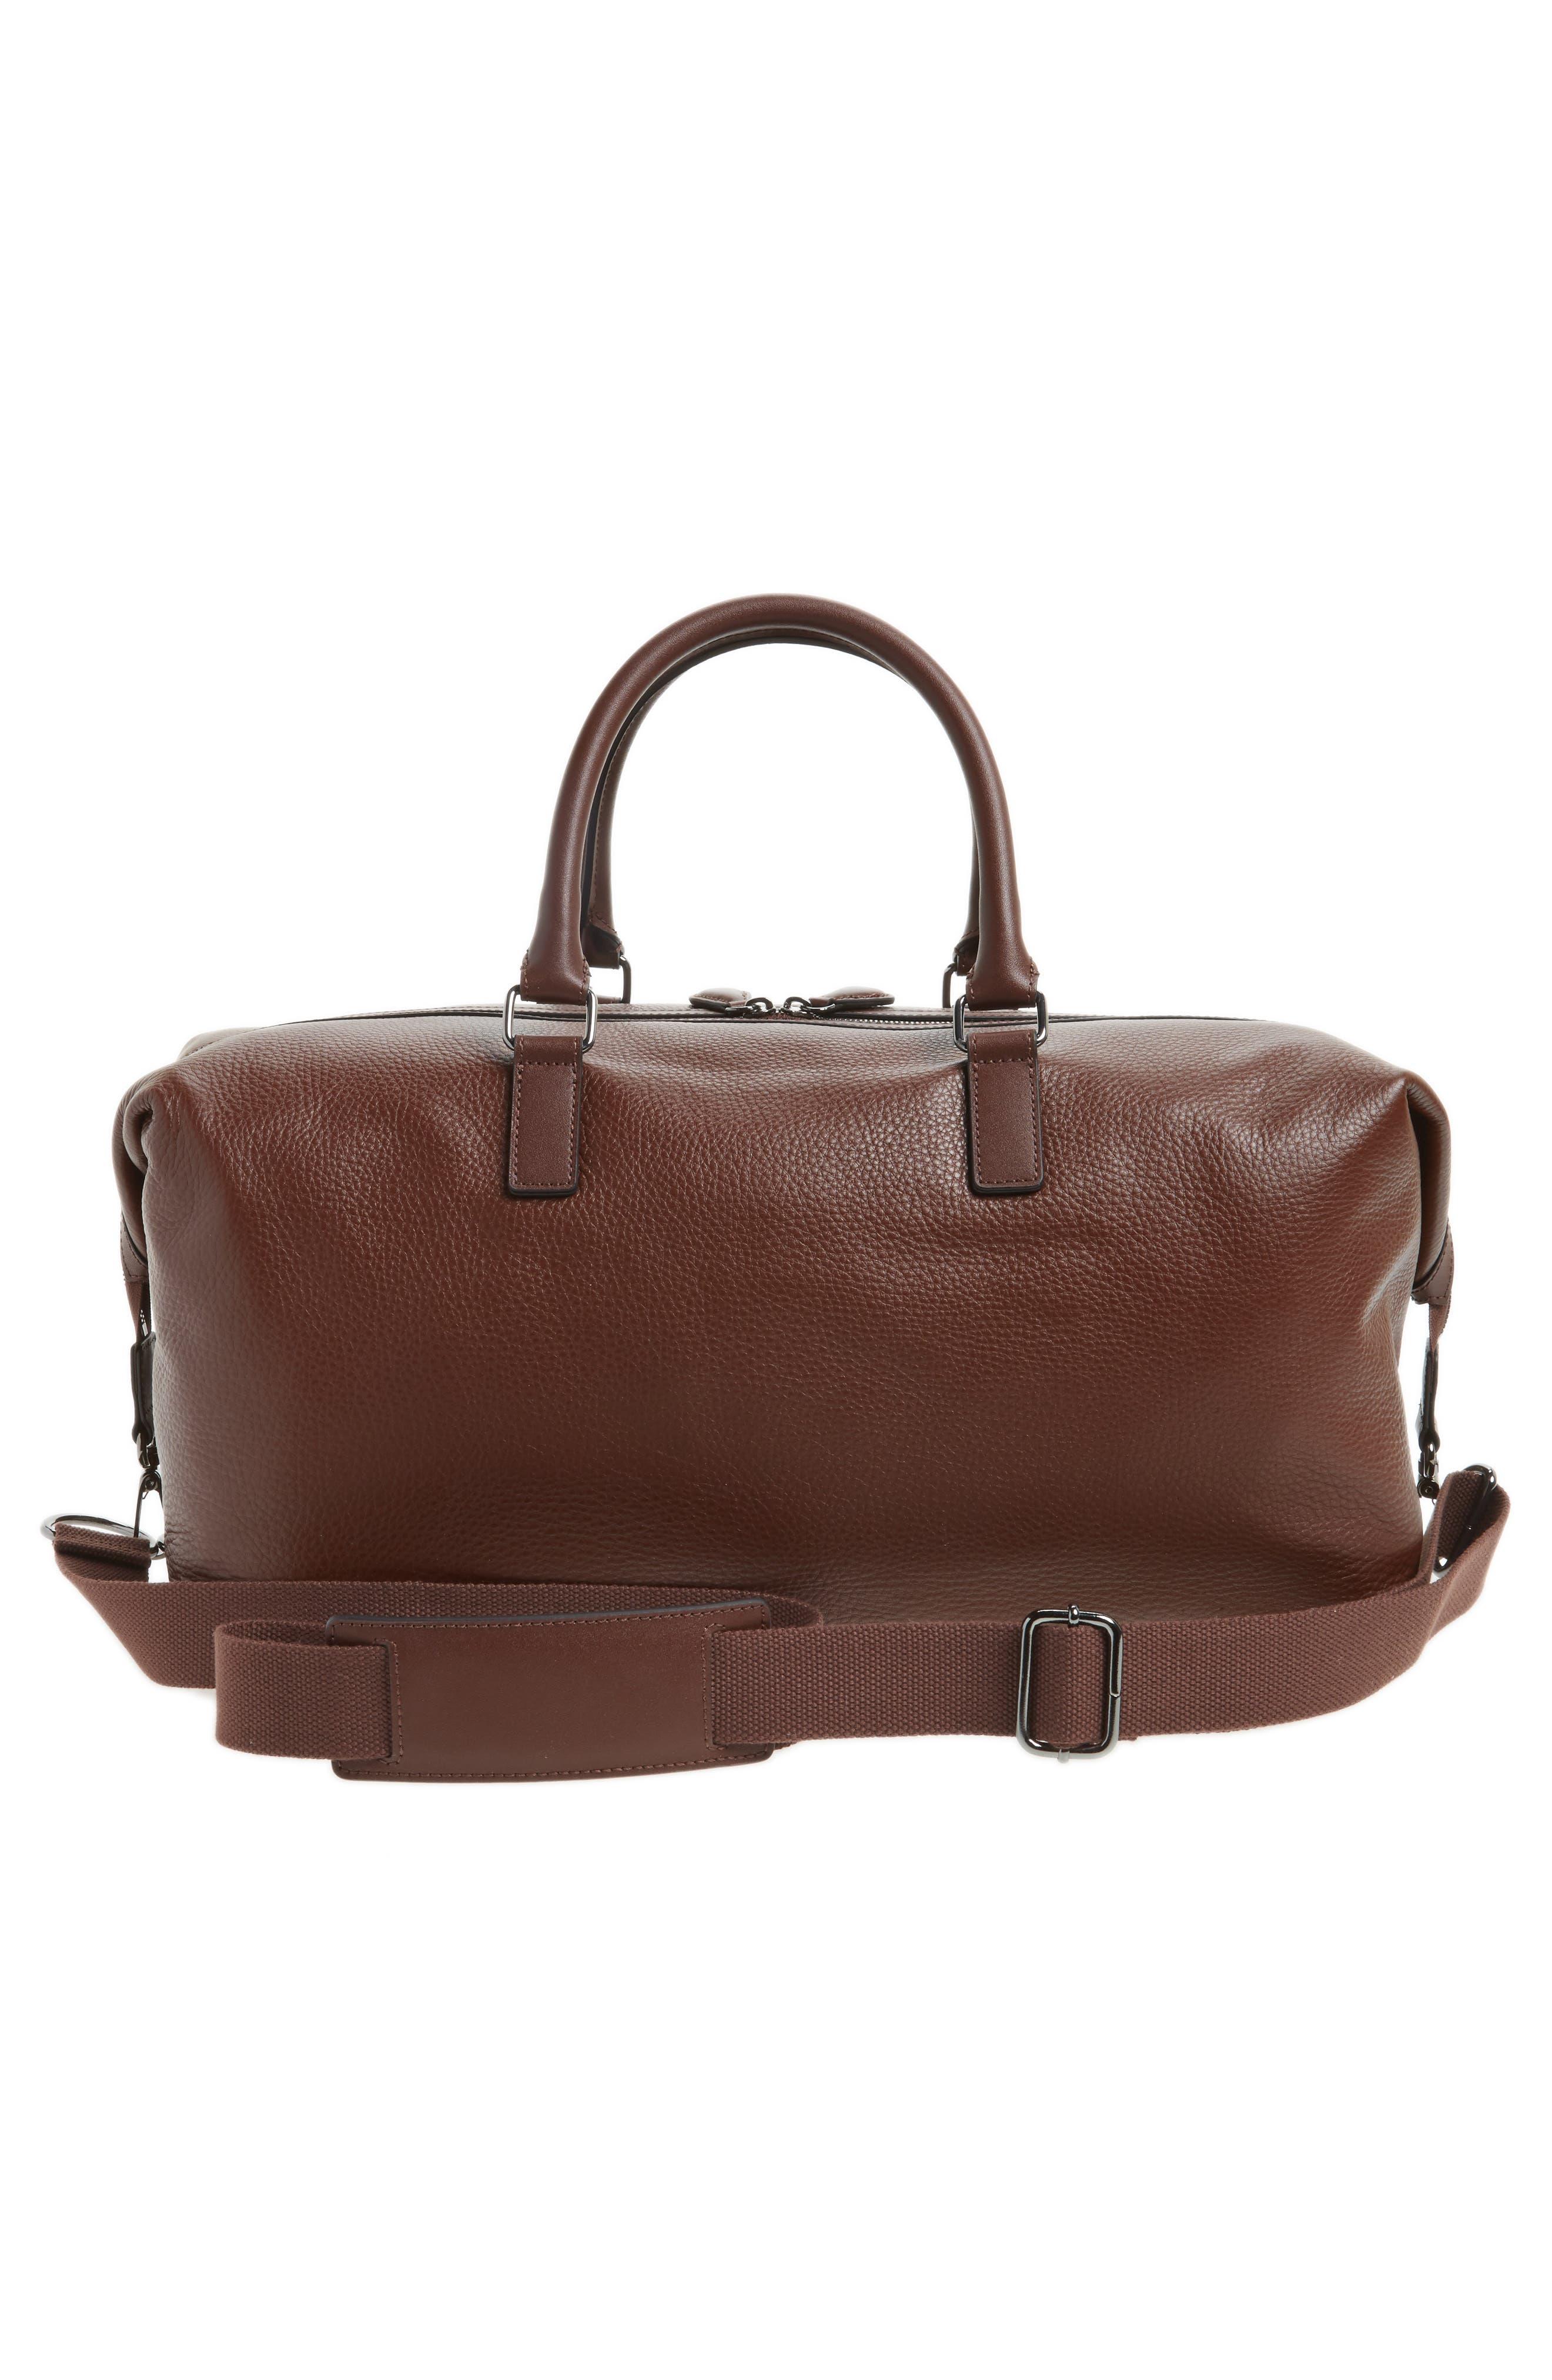 Leather Duffel Bag,                             Alternate thumbnail 3, color,                             217